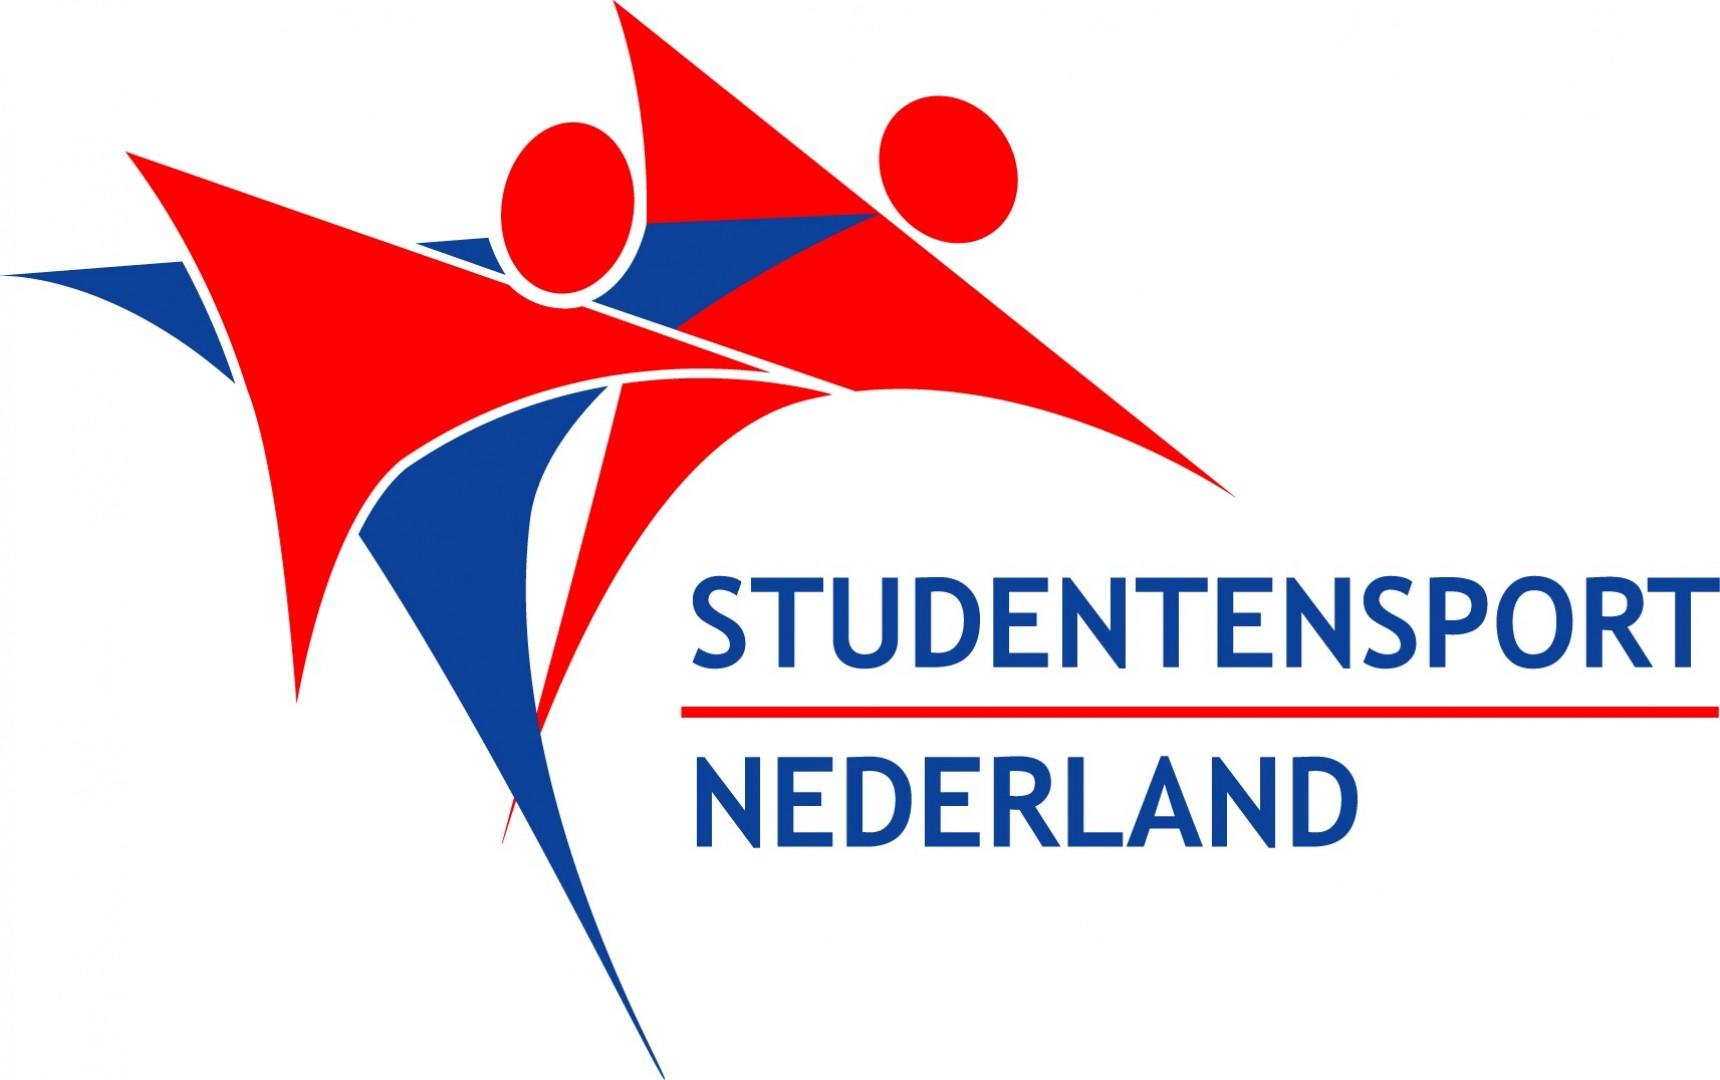 Studentensport Nederland